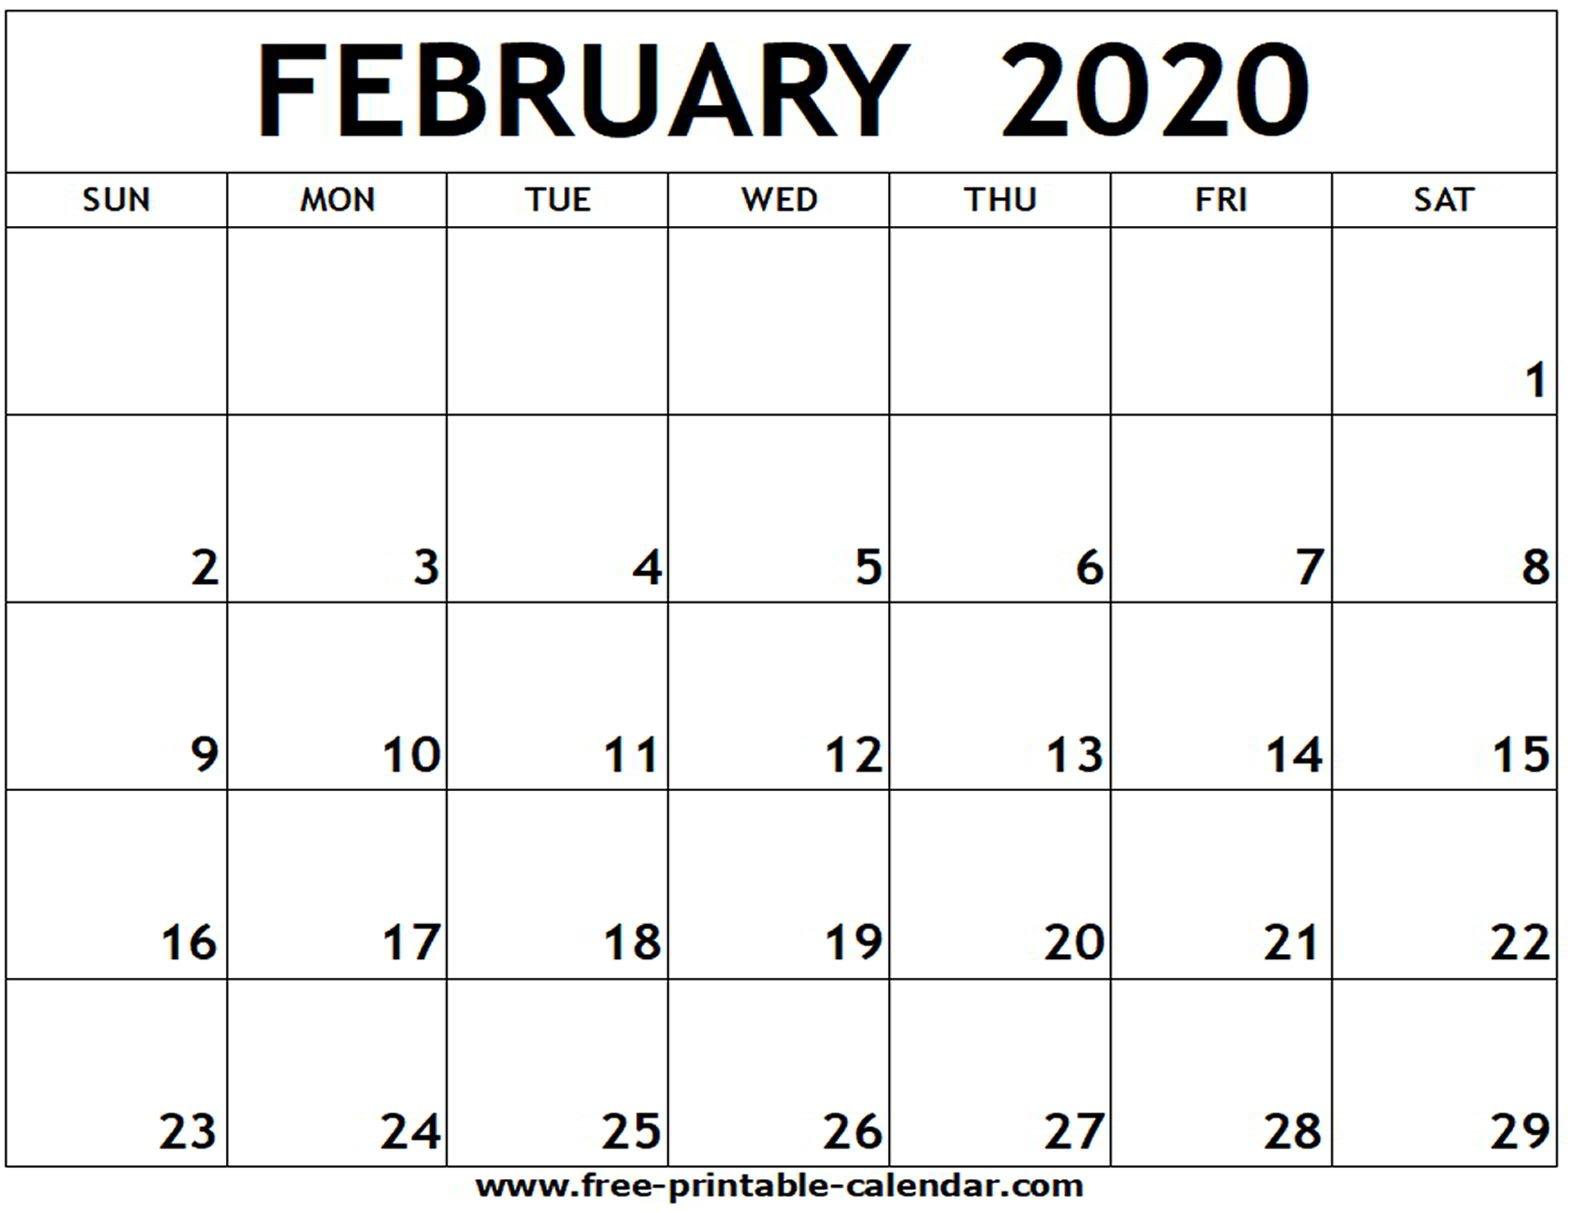 February 2020 Printable Calendar - Free-Printable-Calendar Blank Calendar I Can Edit And Print